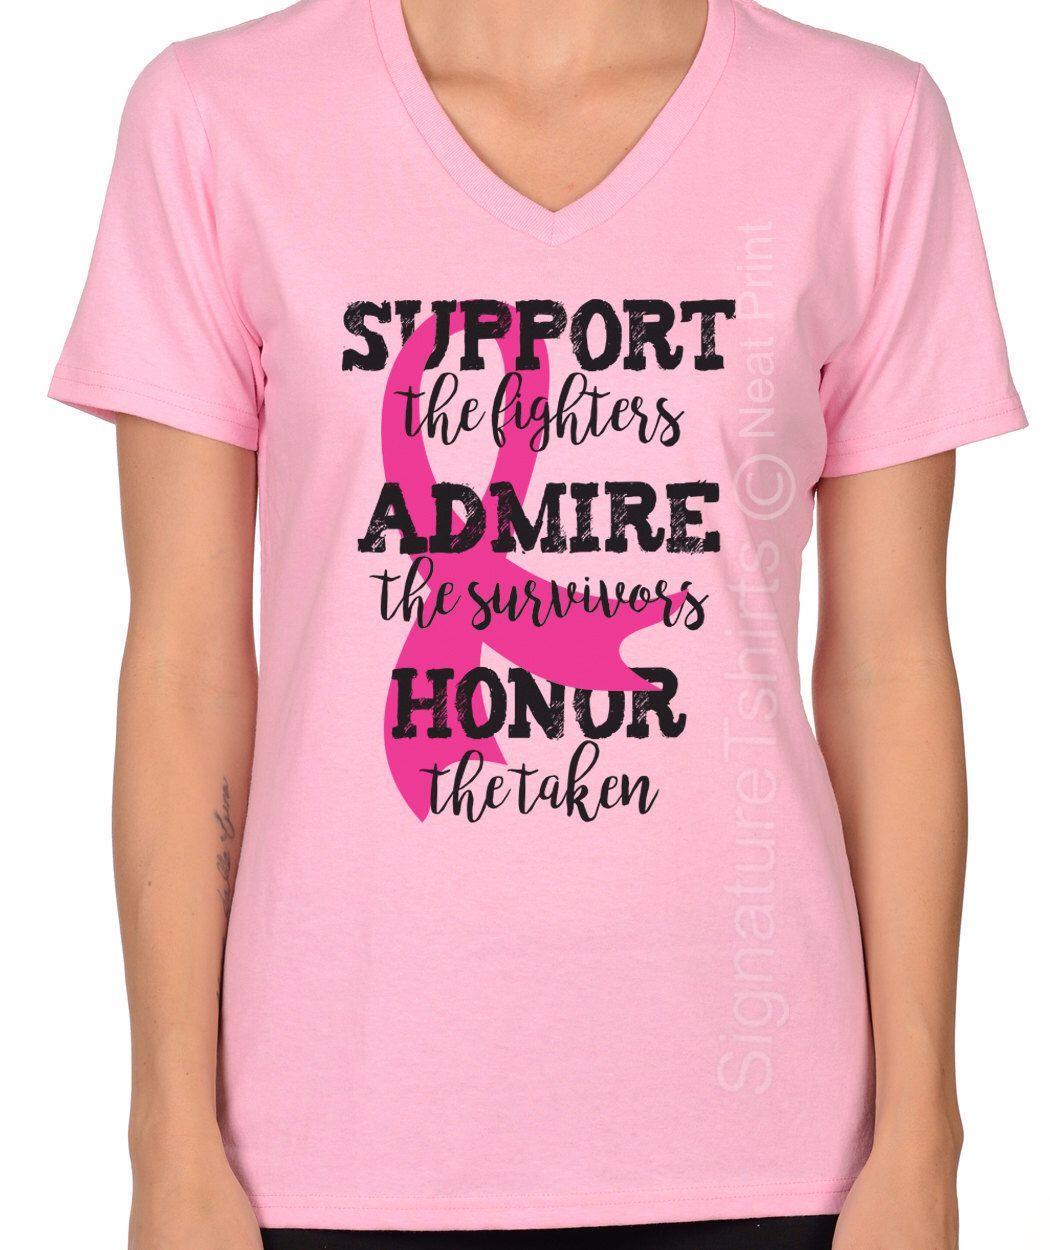 4908f917 Gift For Breast Cancer Survivor, Breast Cancer Shirt, October Pink Ribbon  Shirt, Support